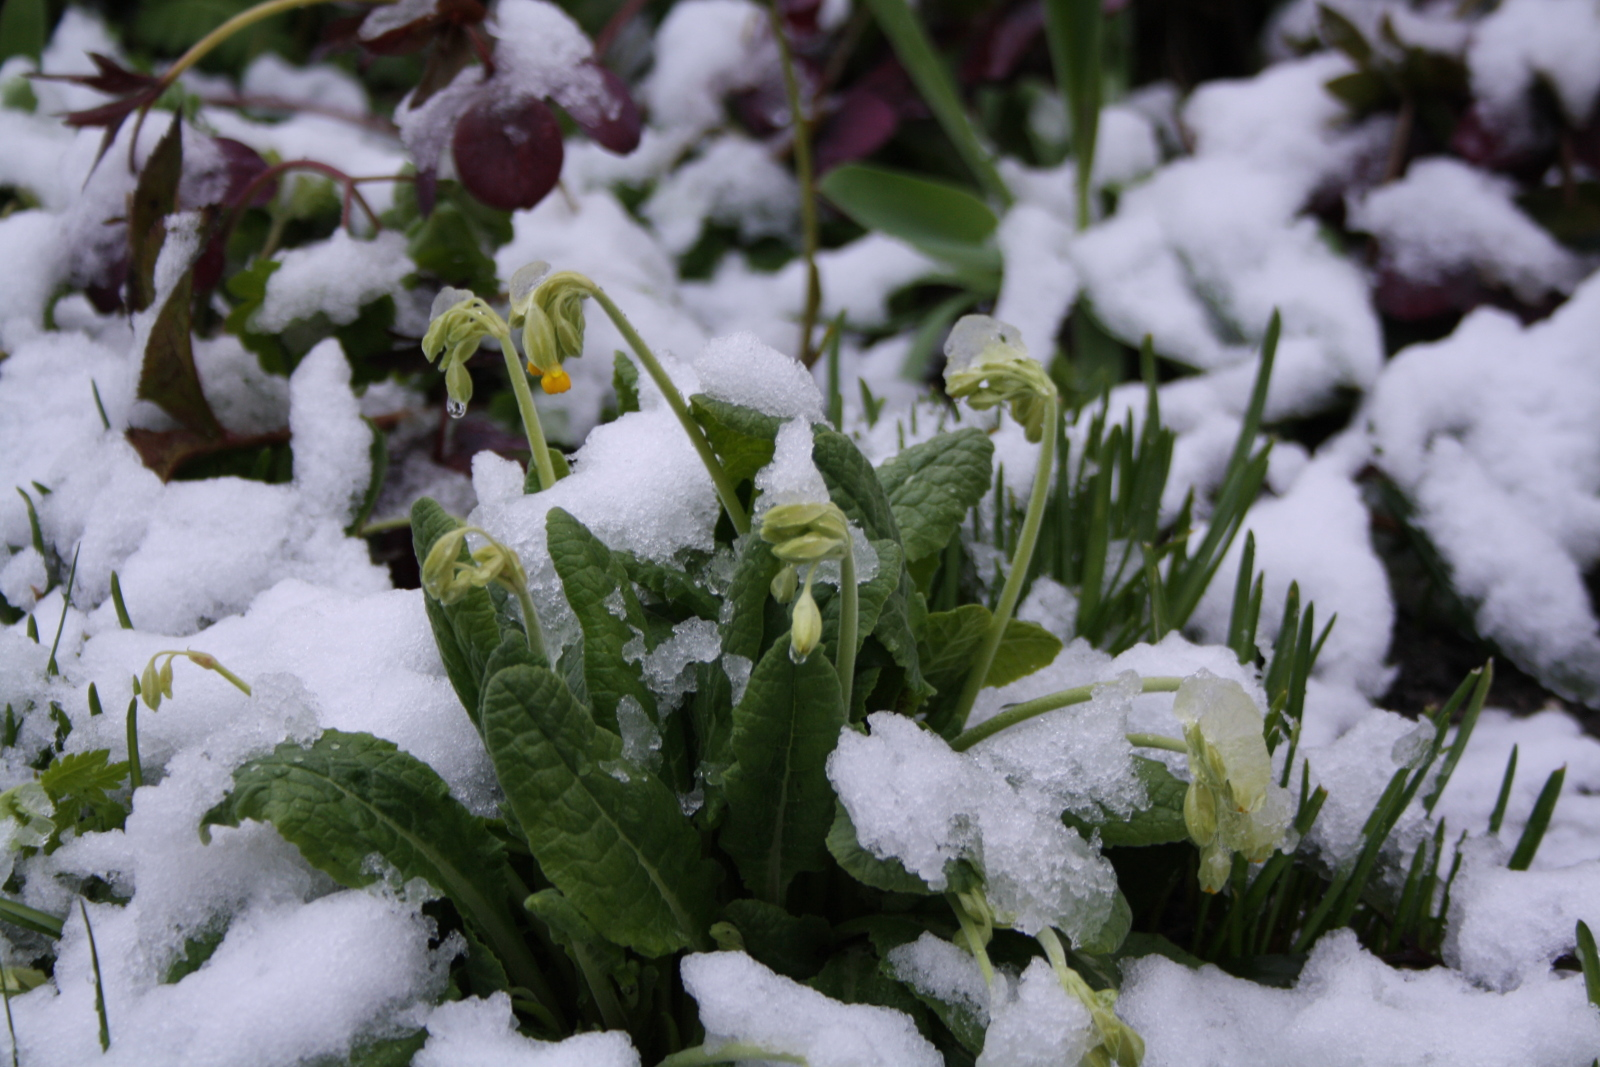 Primula med sne